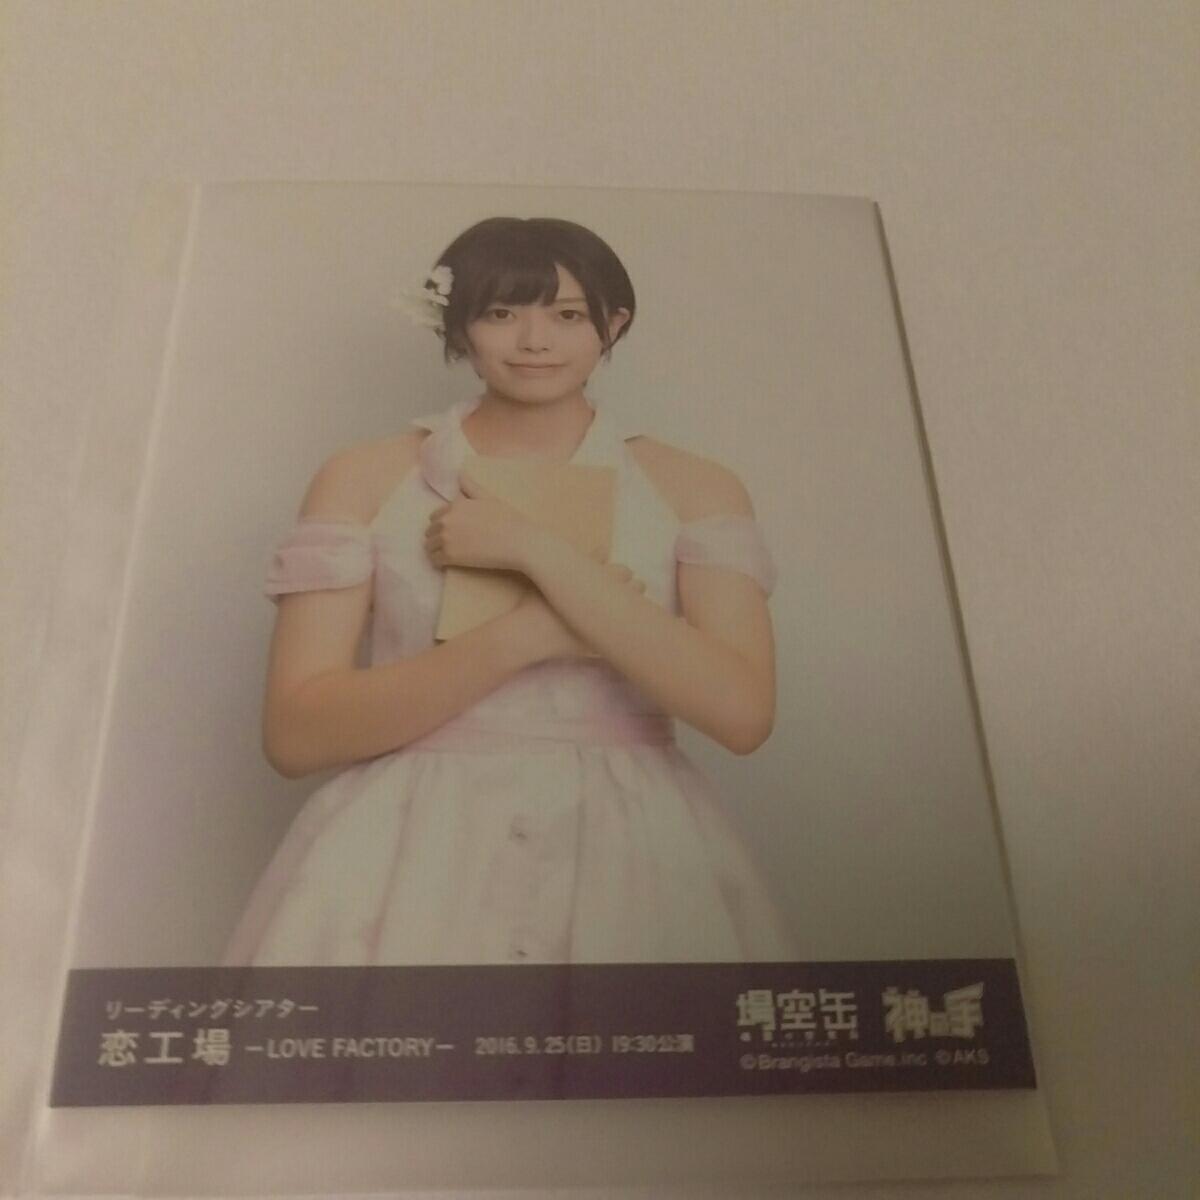 AKB48 チーム8 早坂つむぎ 神の手 場空缶 恋工場 限定生写真 ライブ・総選挙グッズの画像